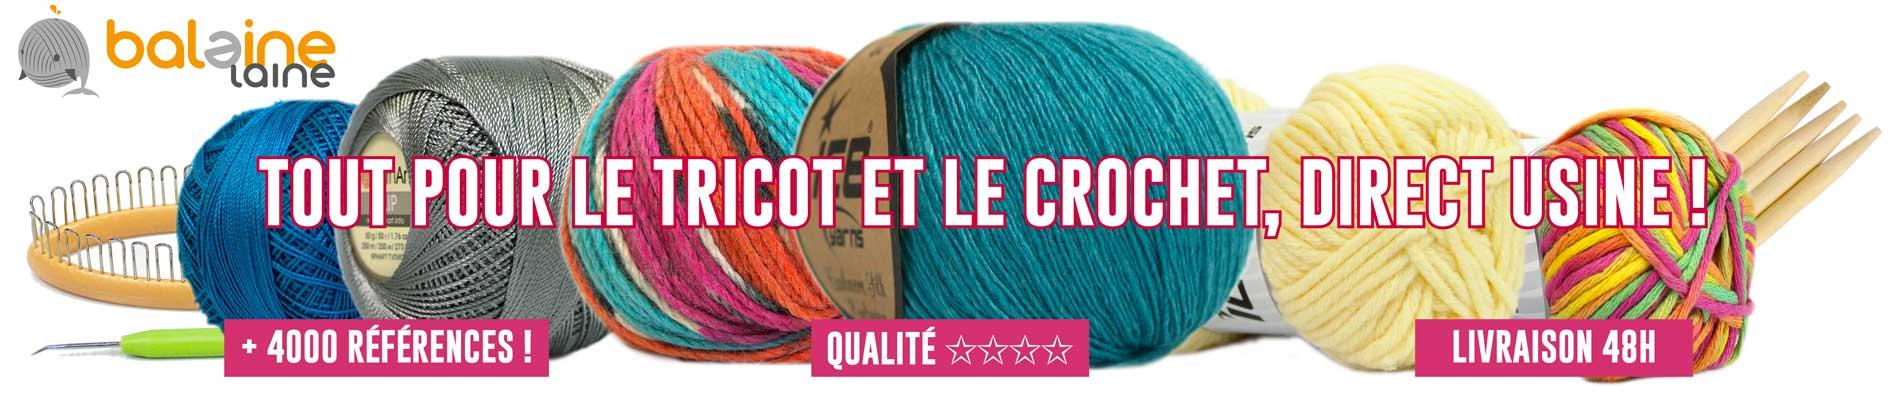 laine a tricoter direct usine